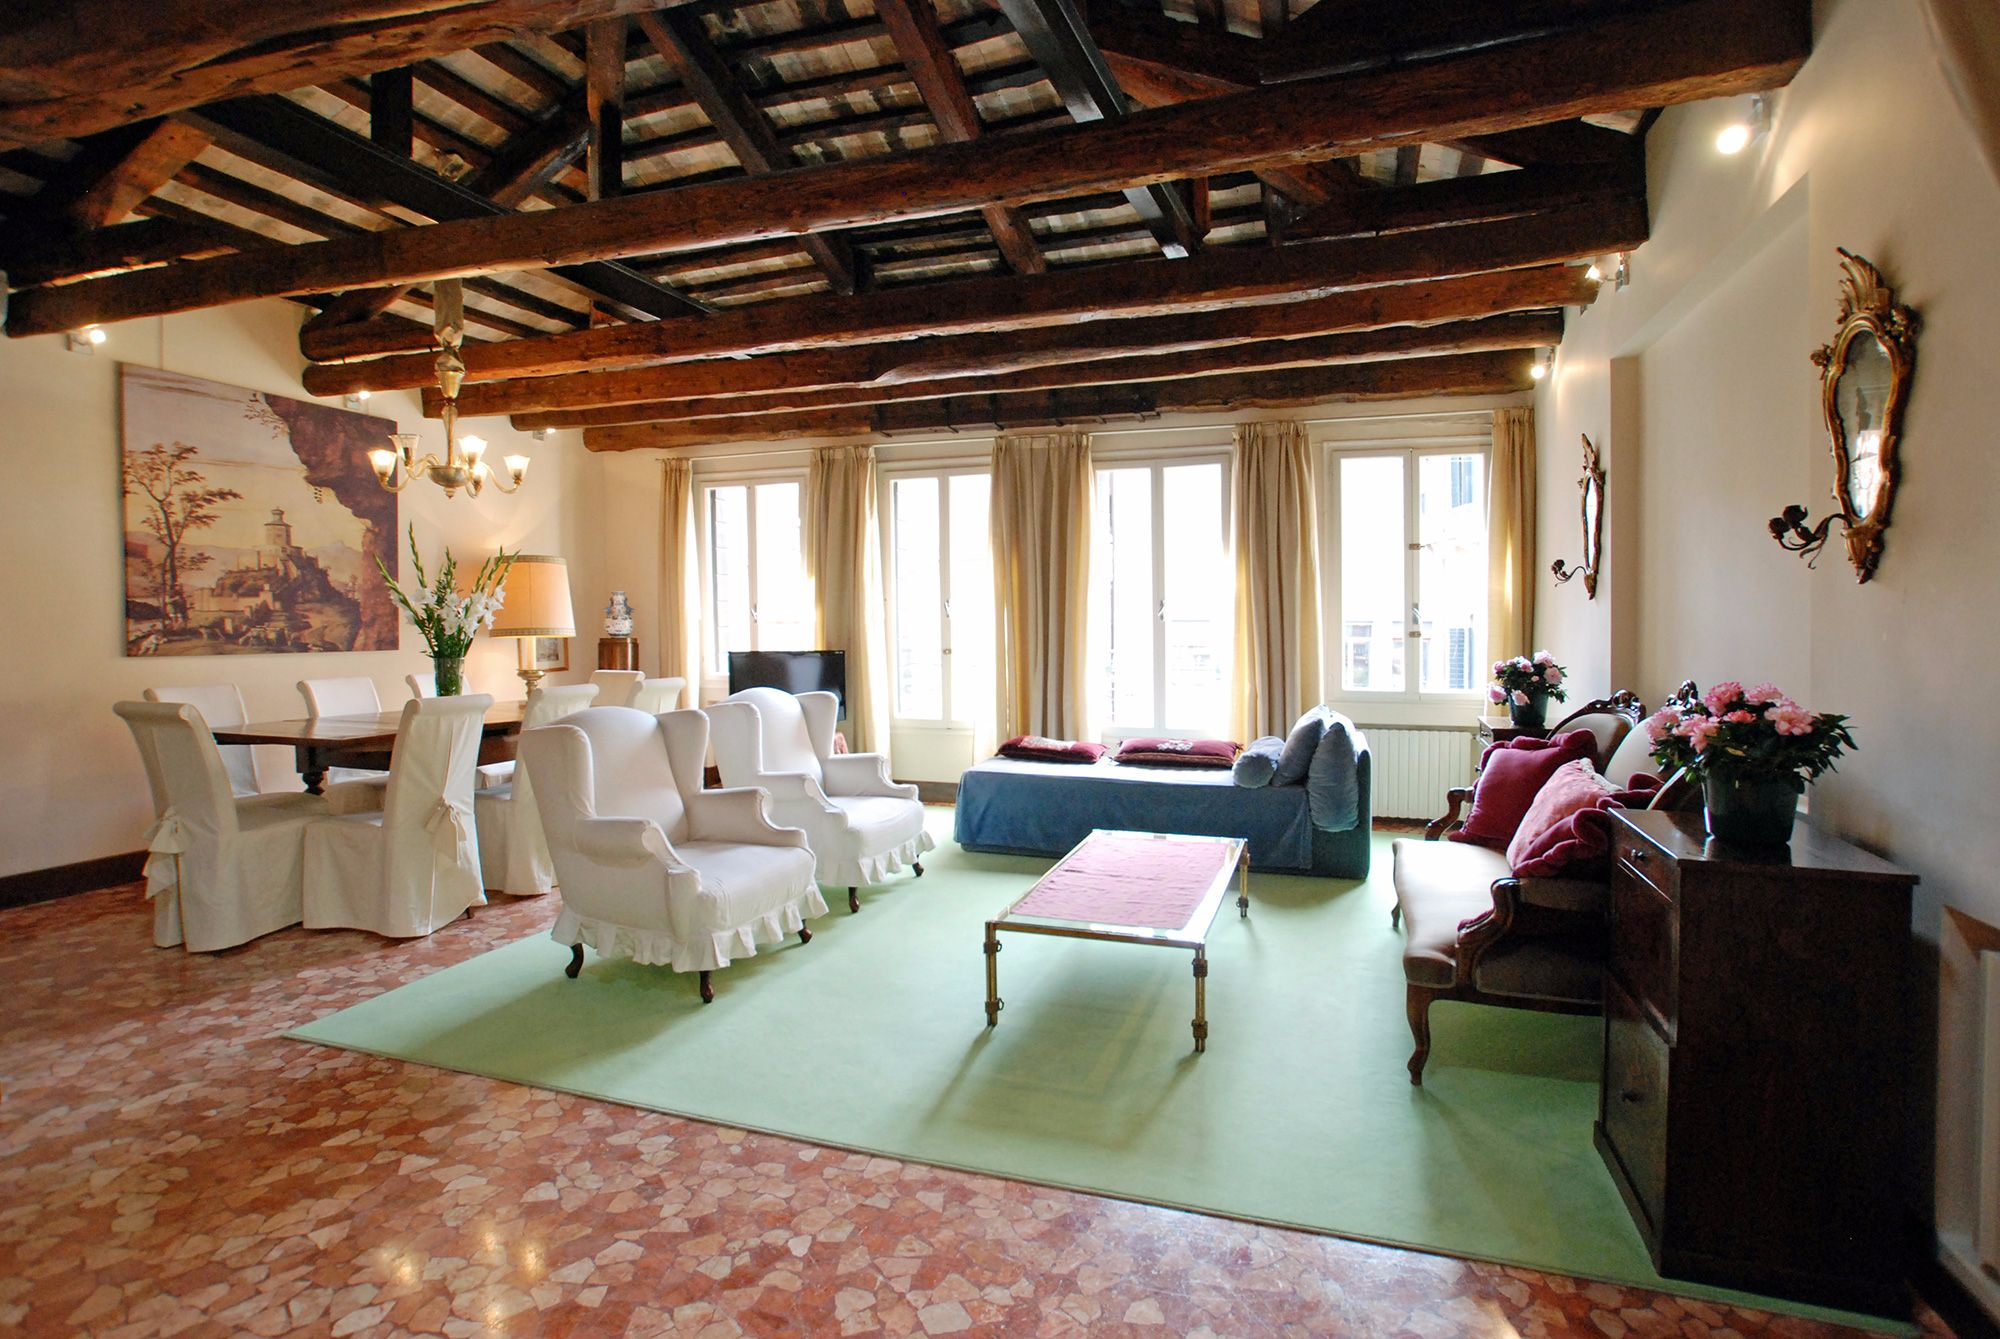 the grand living room of Mocenigo apartment in Venice